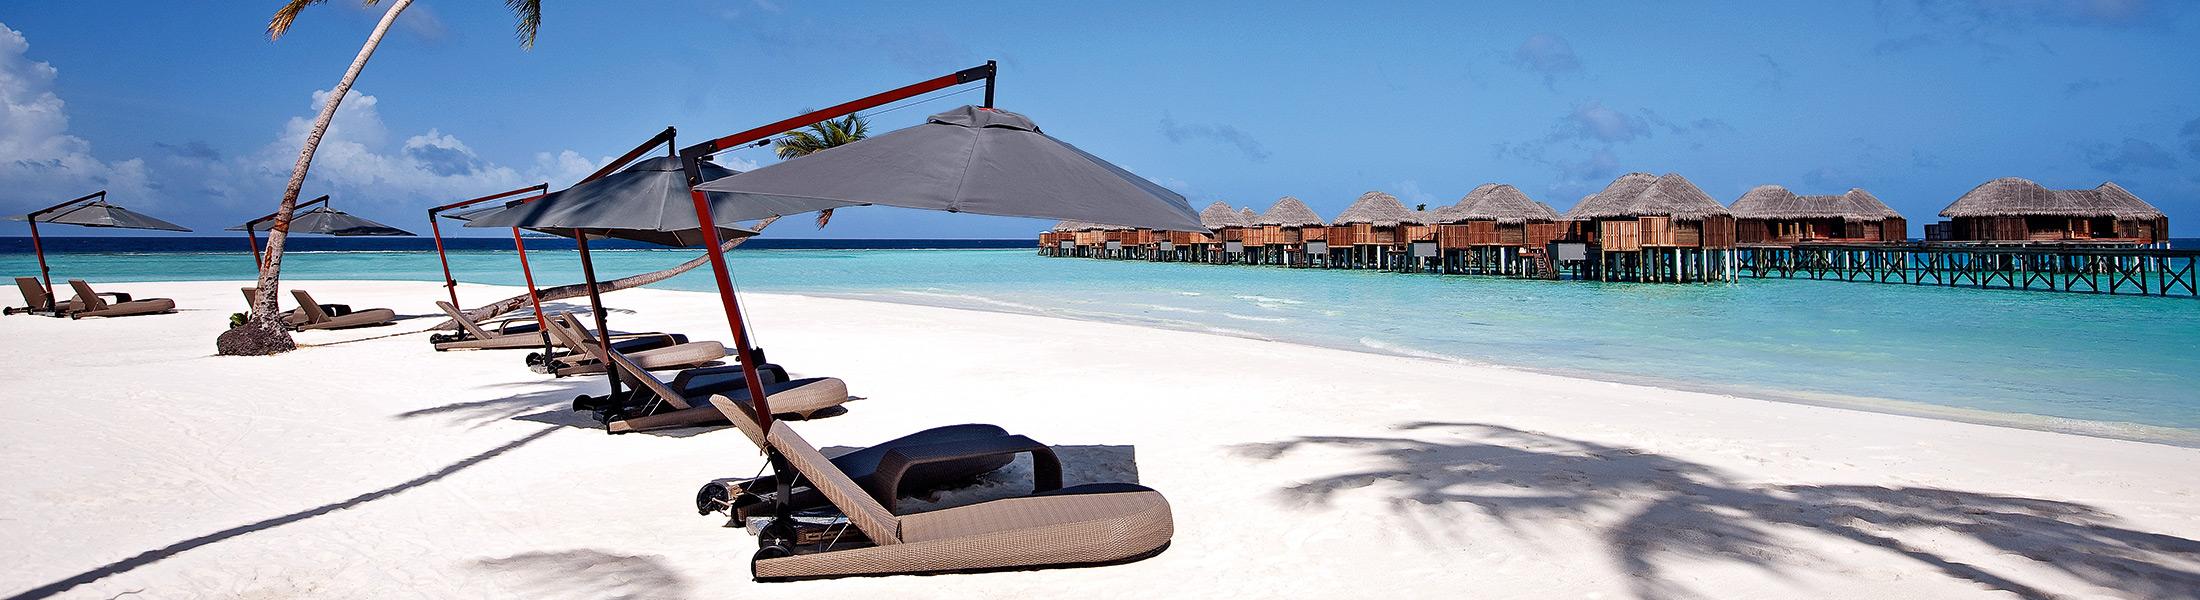 Beach sun loungers at Constance Halaveli